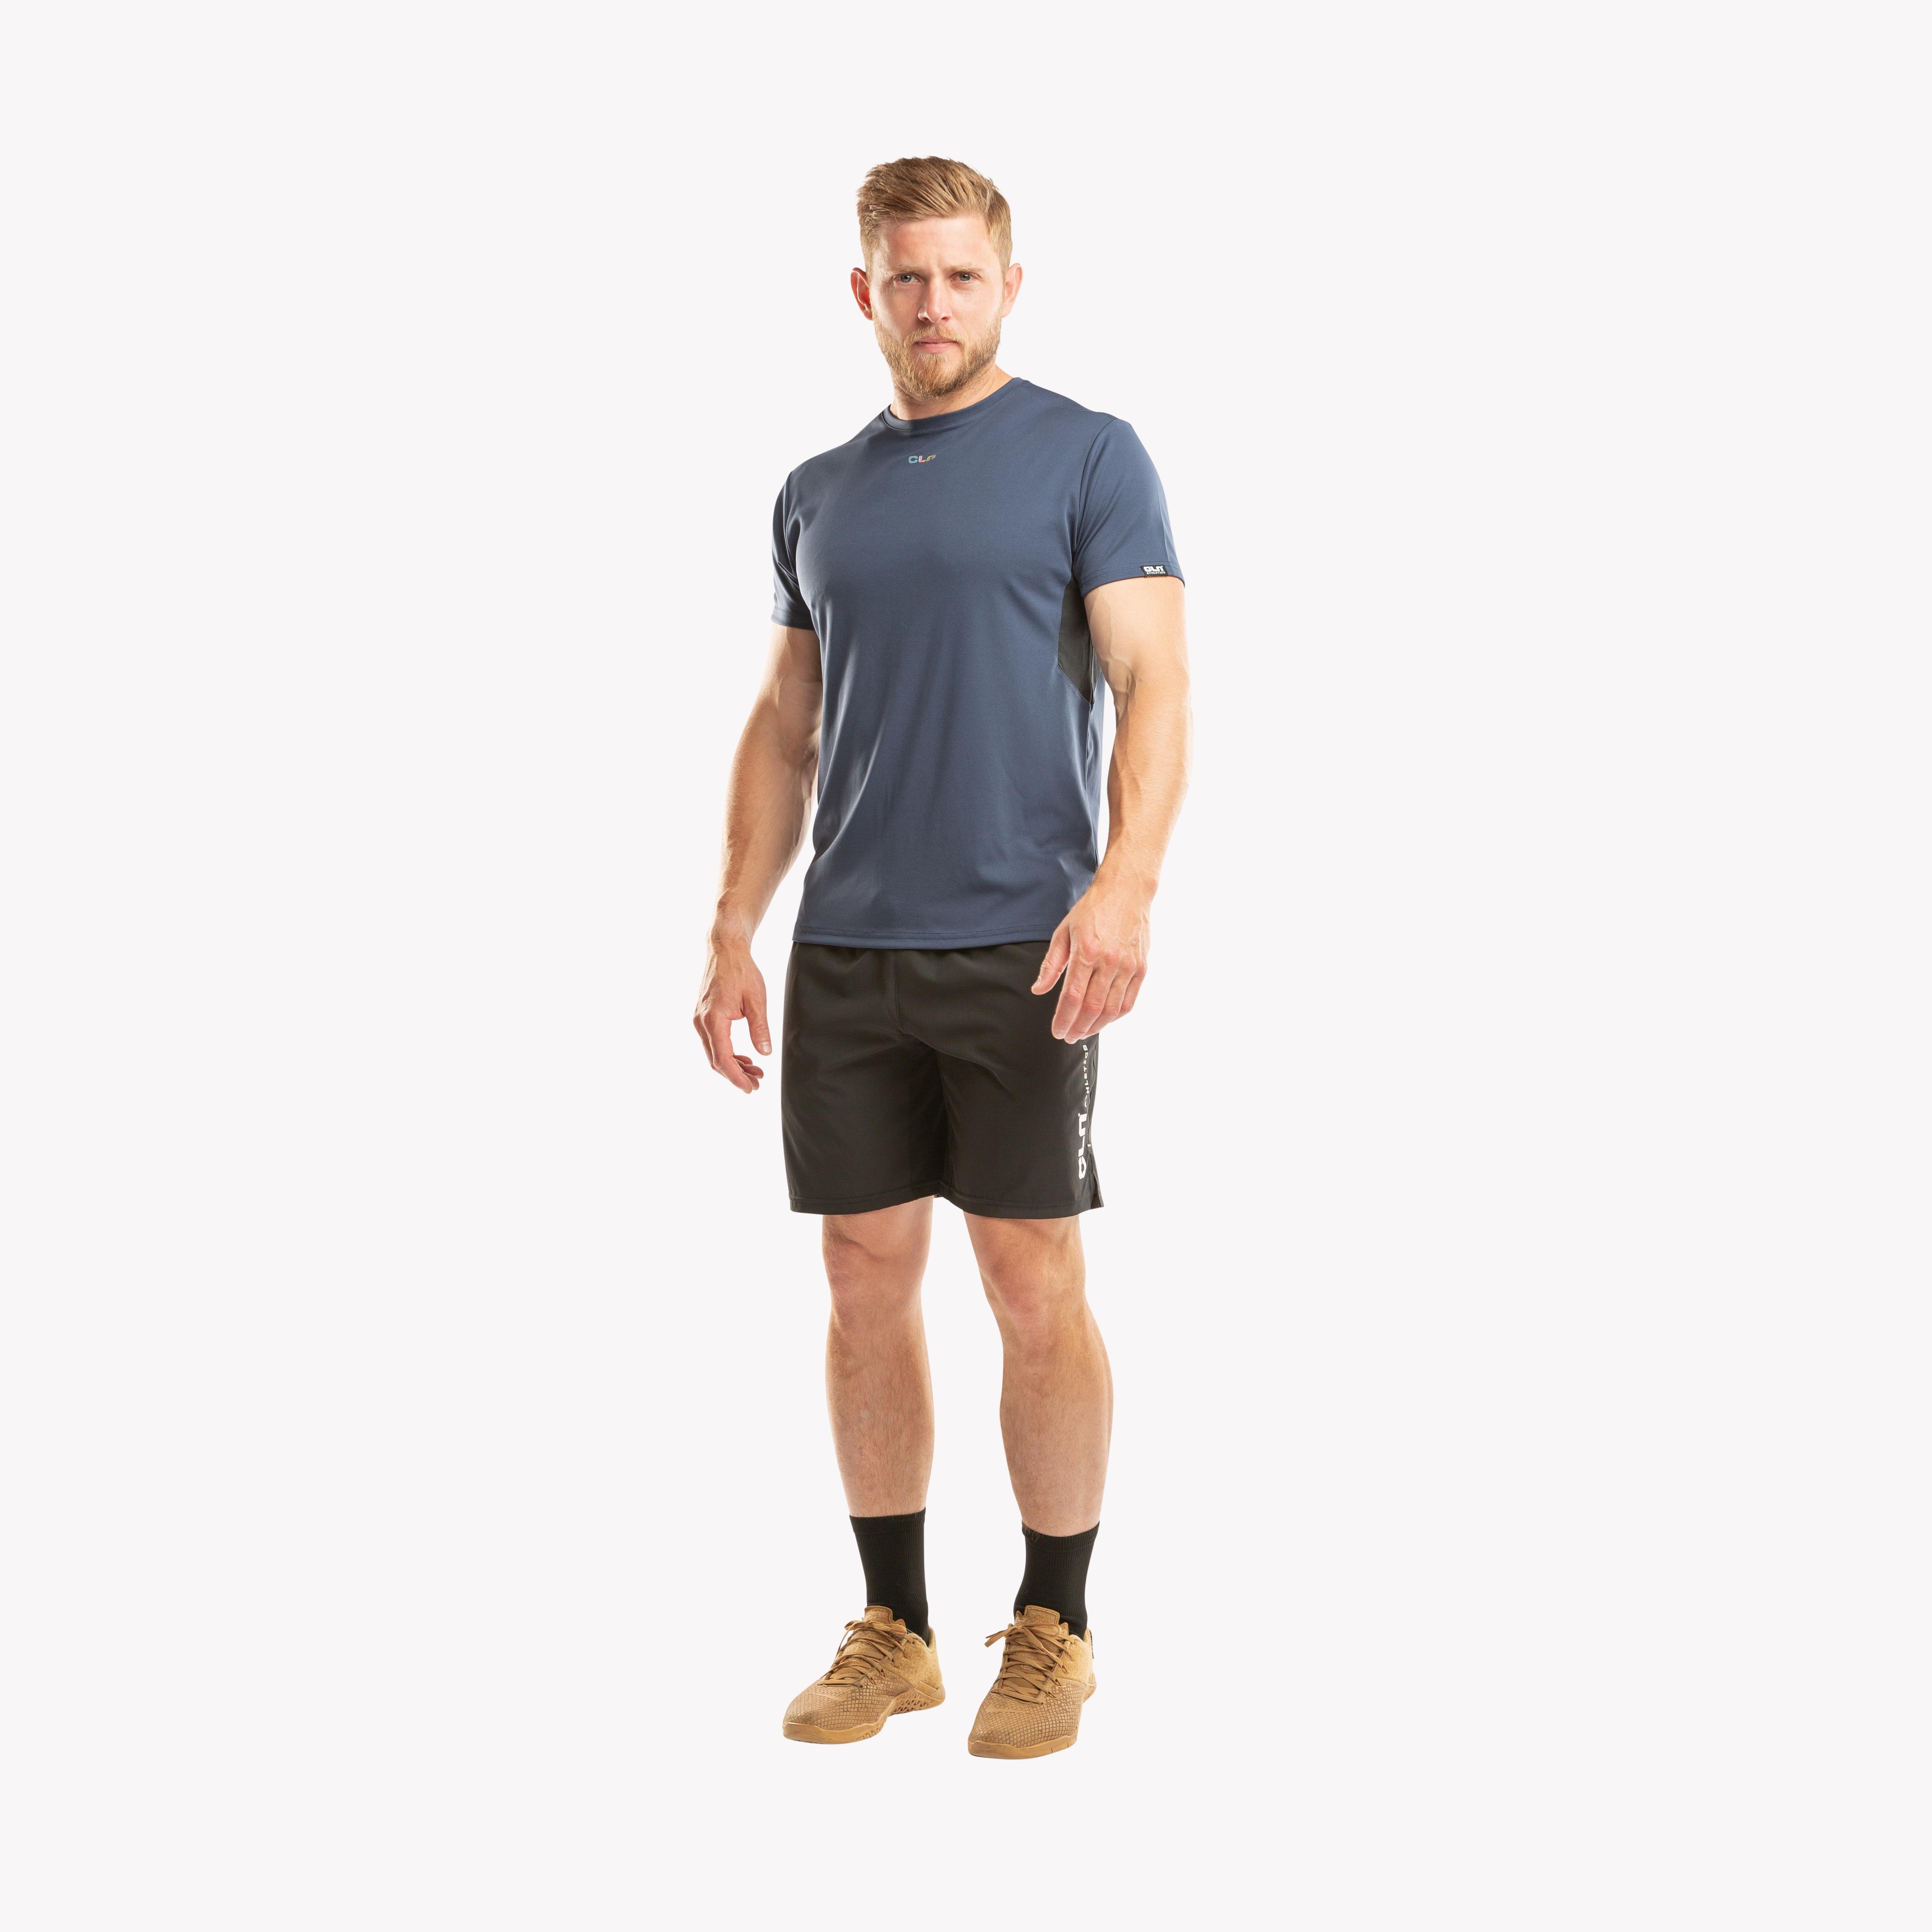 CLN Exhaust t-shirt Indigo blue